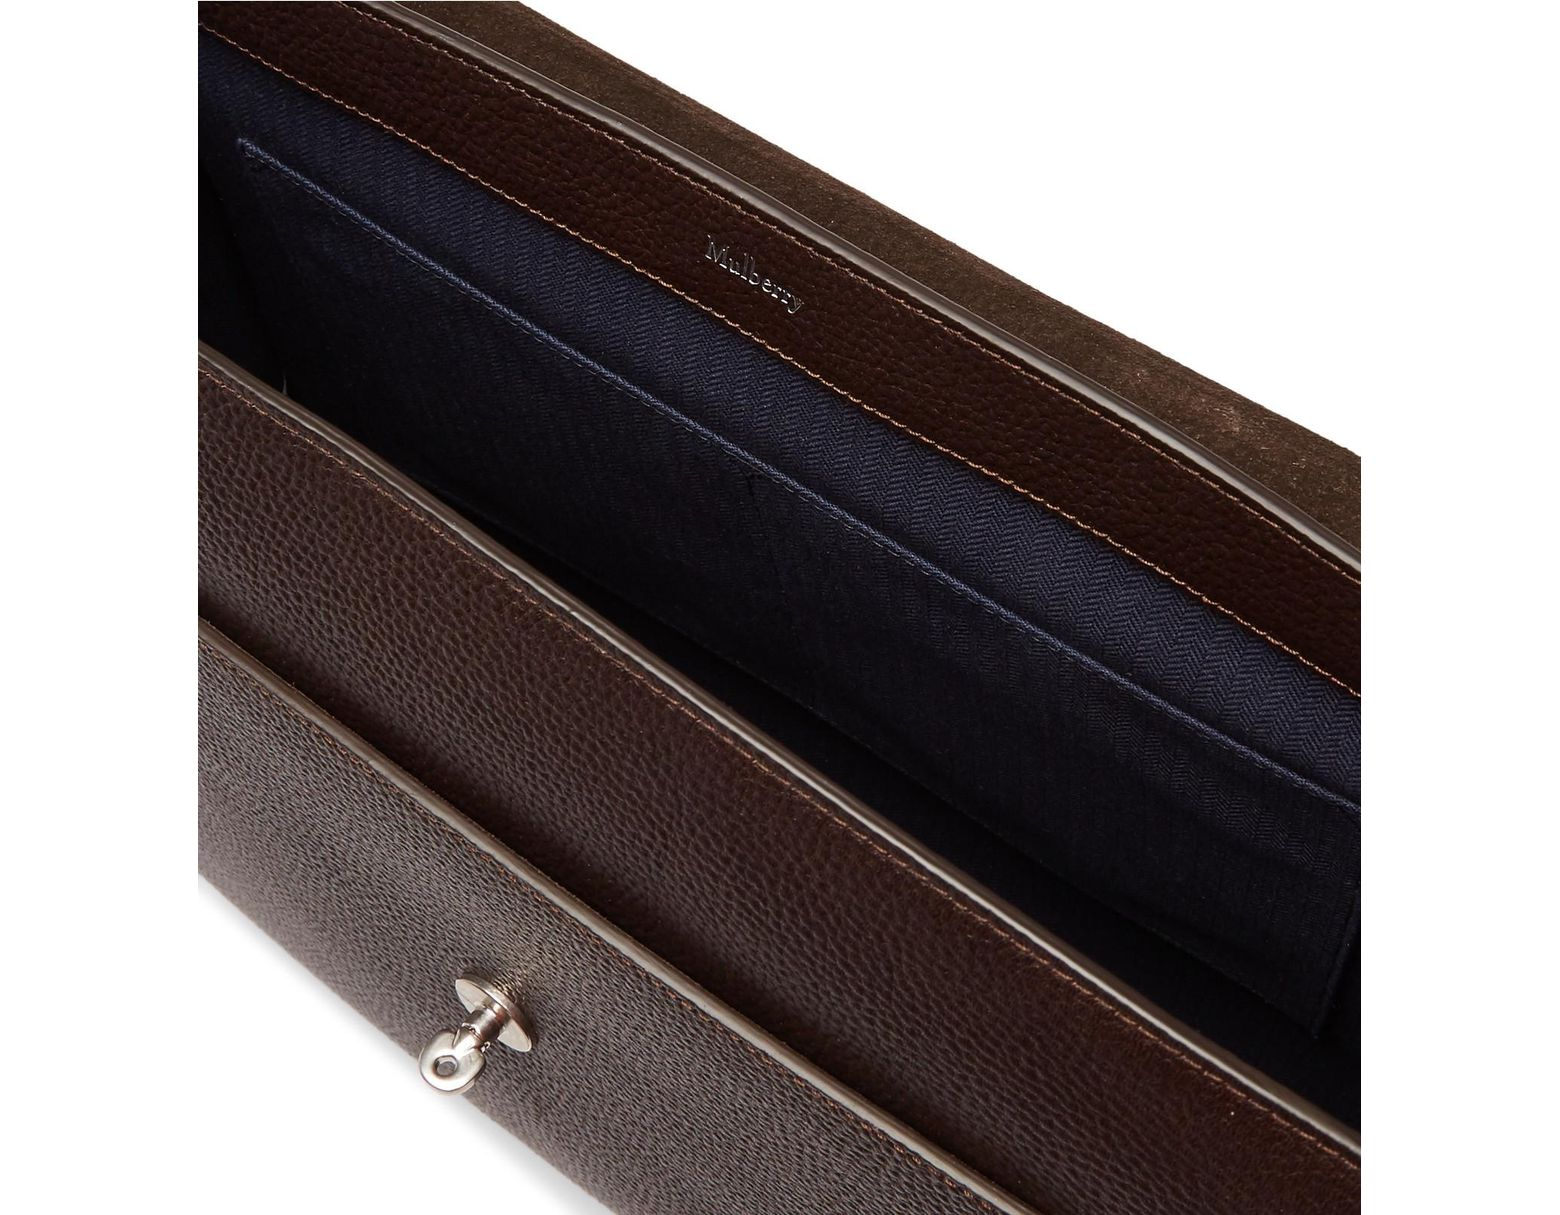 cb264cc49 Mulberry East West Antony Padlock Pebble-grain Leather Messenger Bag in  Brown for Men - Lyst